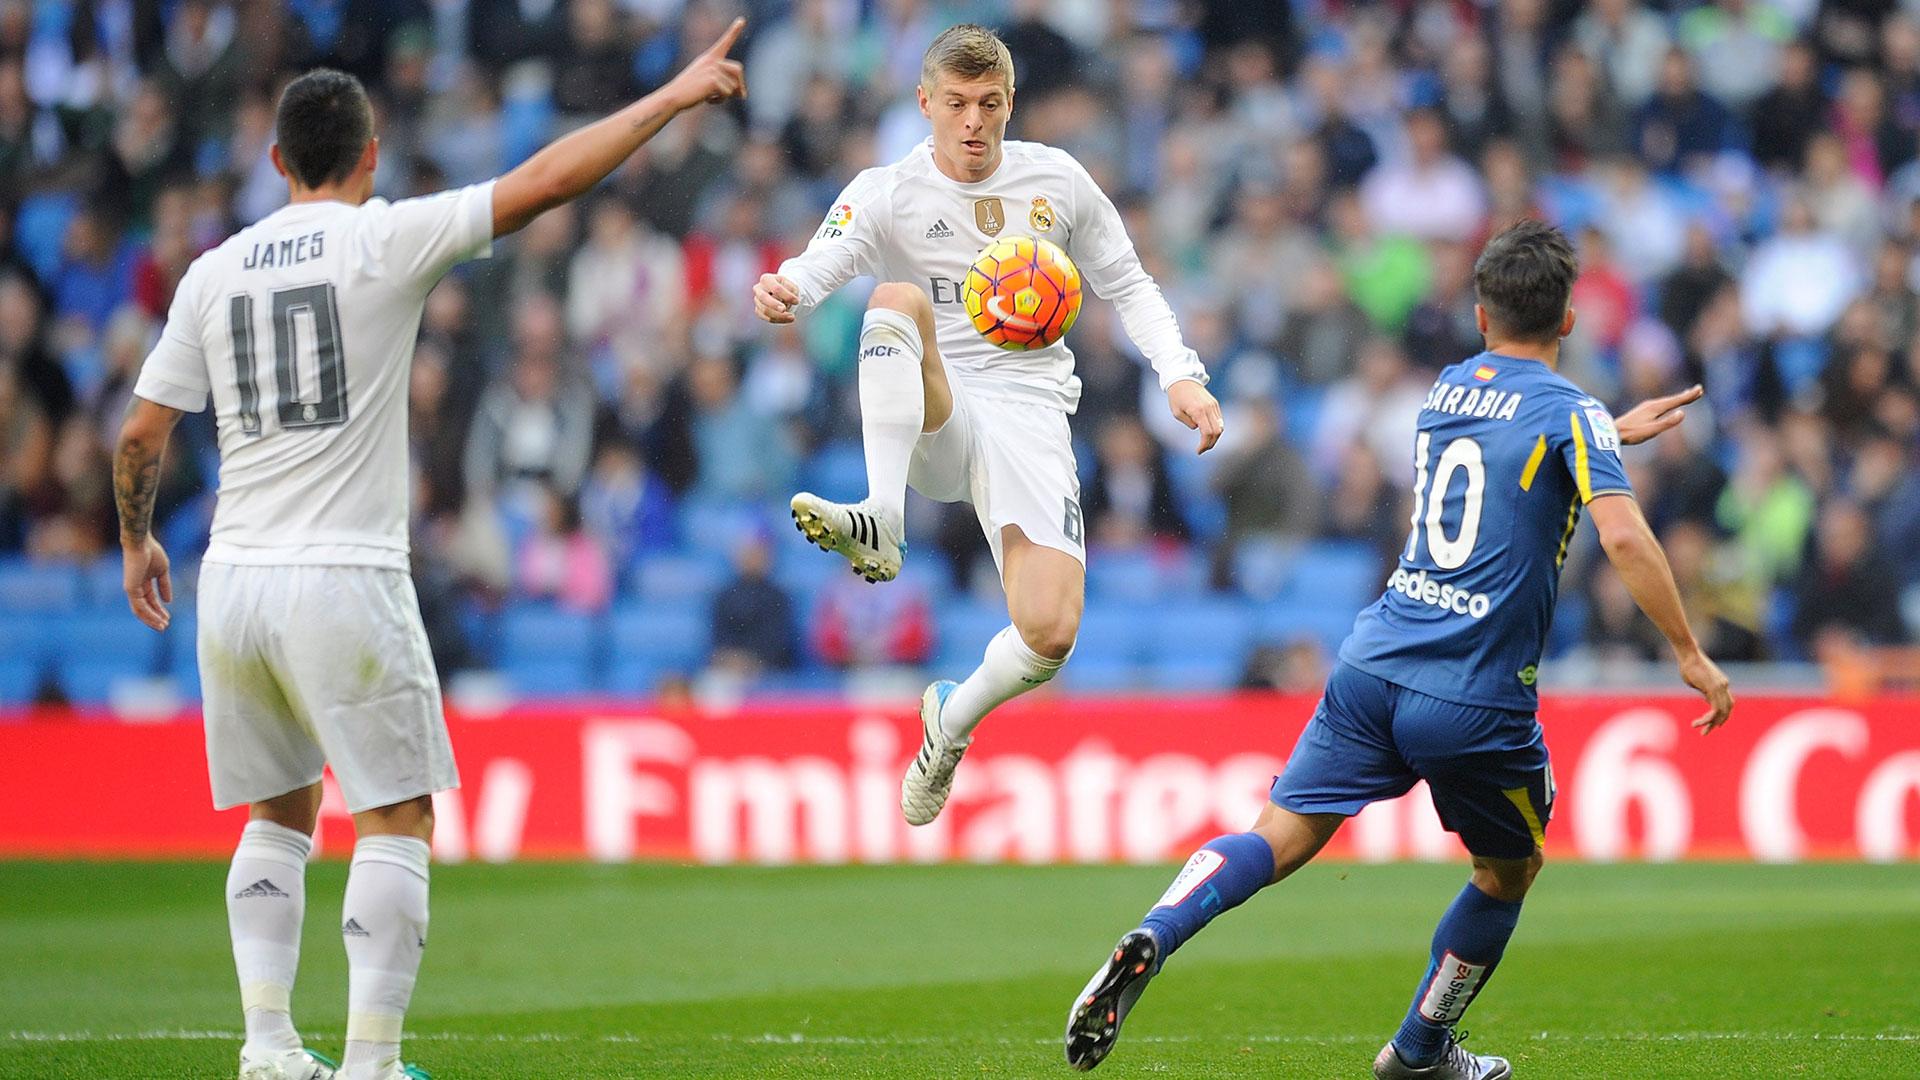 La madre de James Rodríguez explota con Zinedine Zidane — Real Madrid